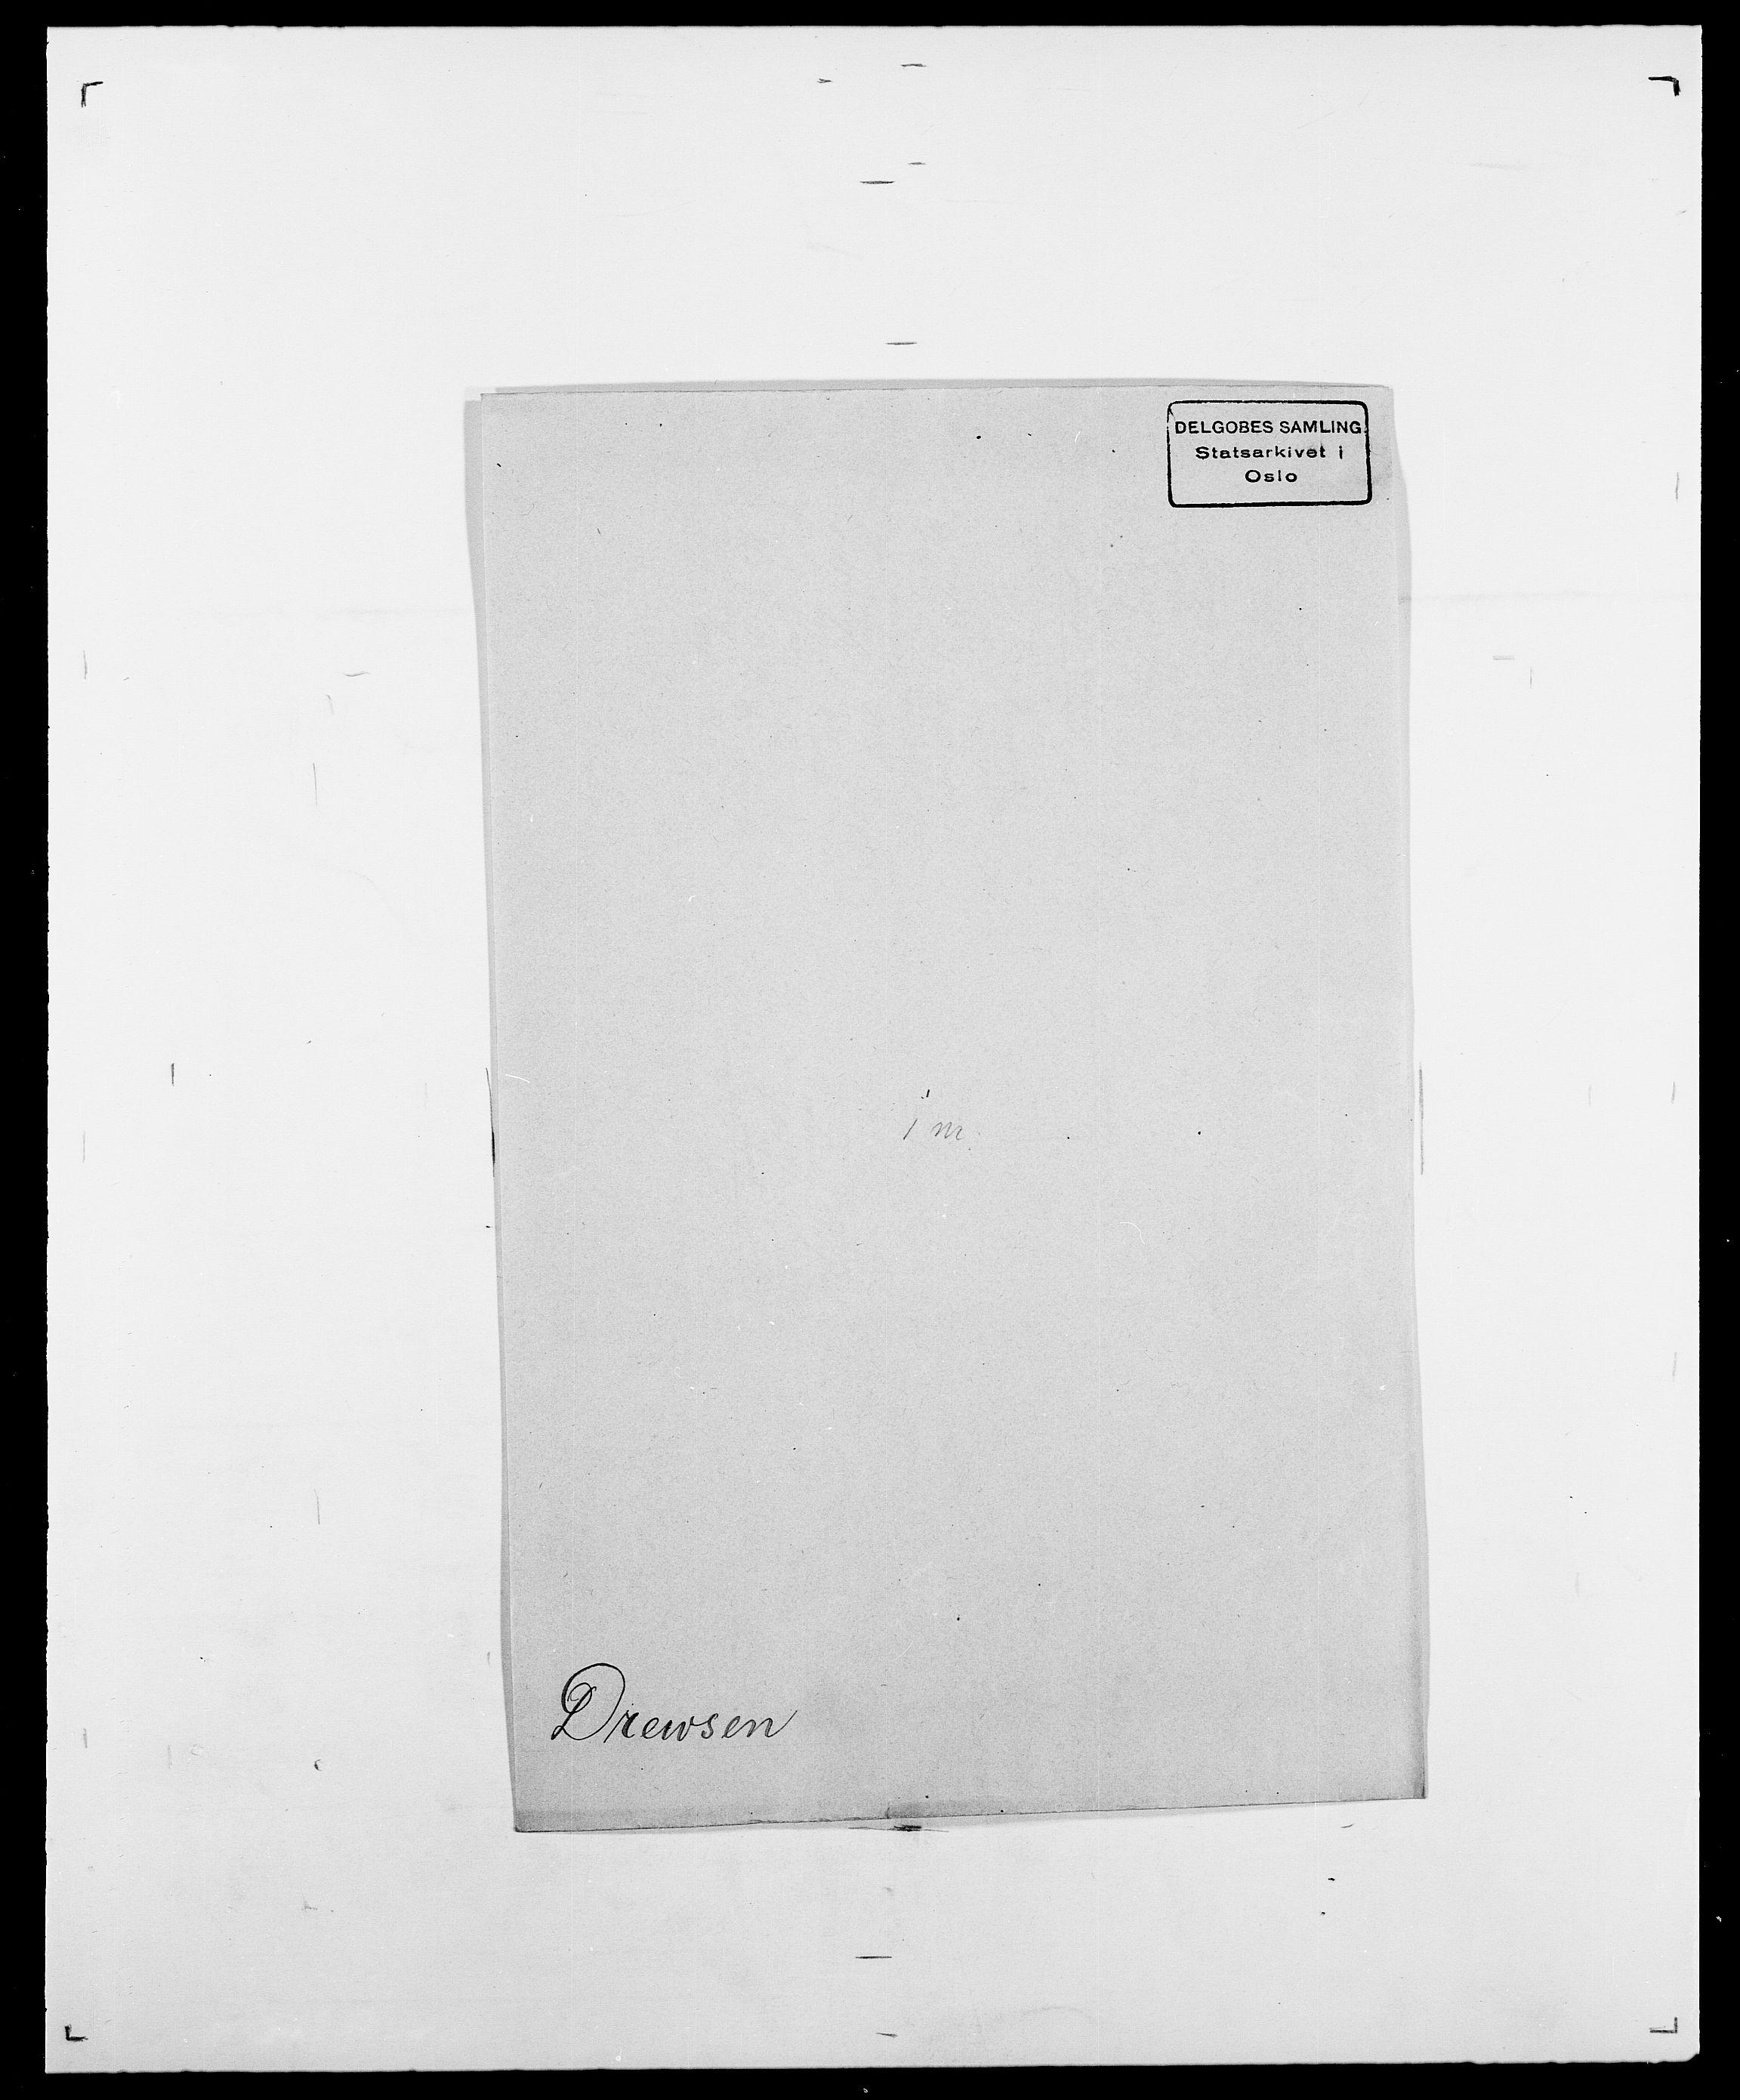 SAO, Delgobe, Charles Antoine - samling, D/Da/L0009: Dahl - v. Düren, s. 781